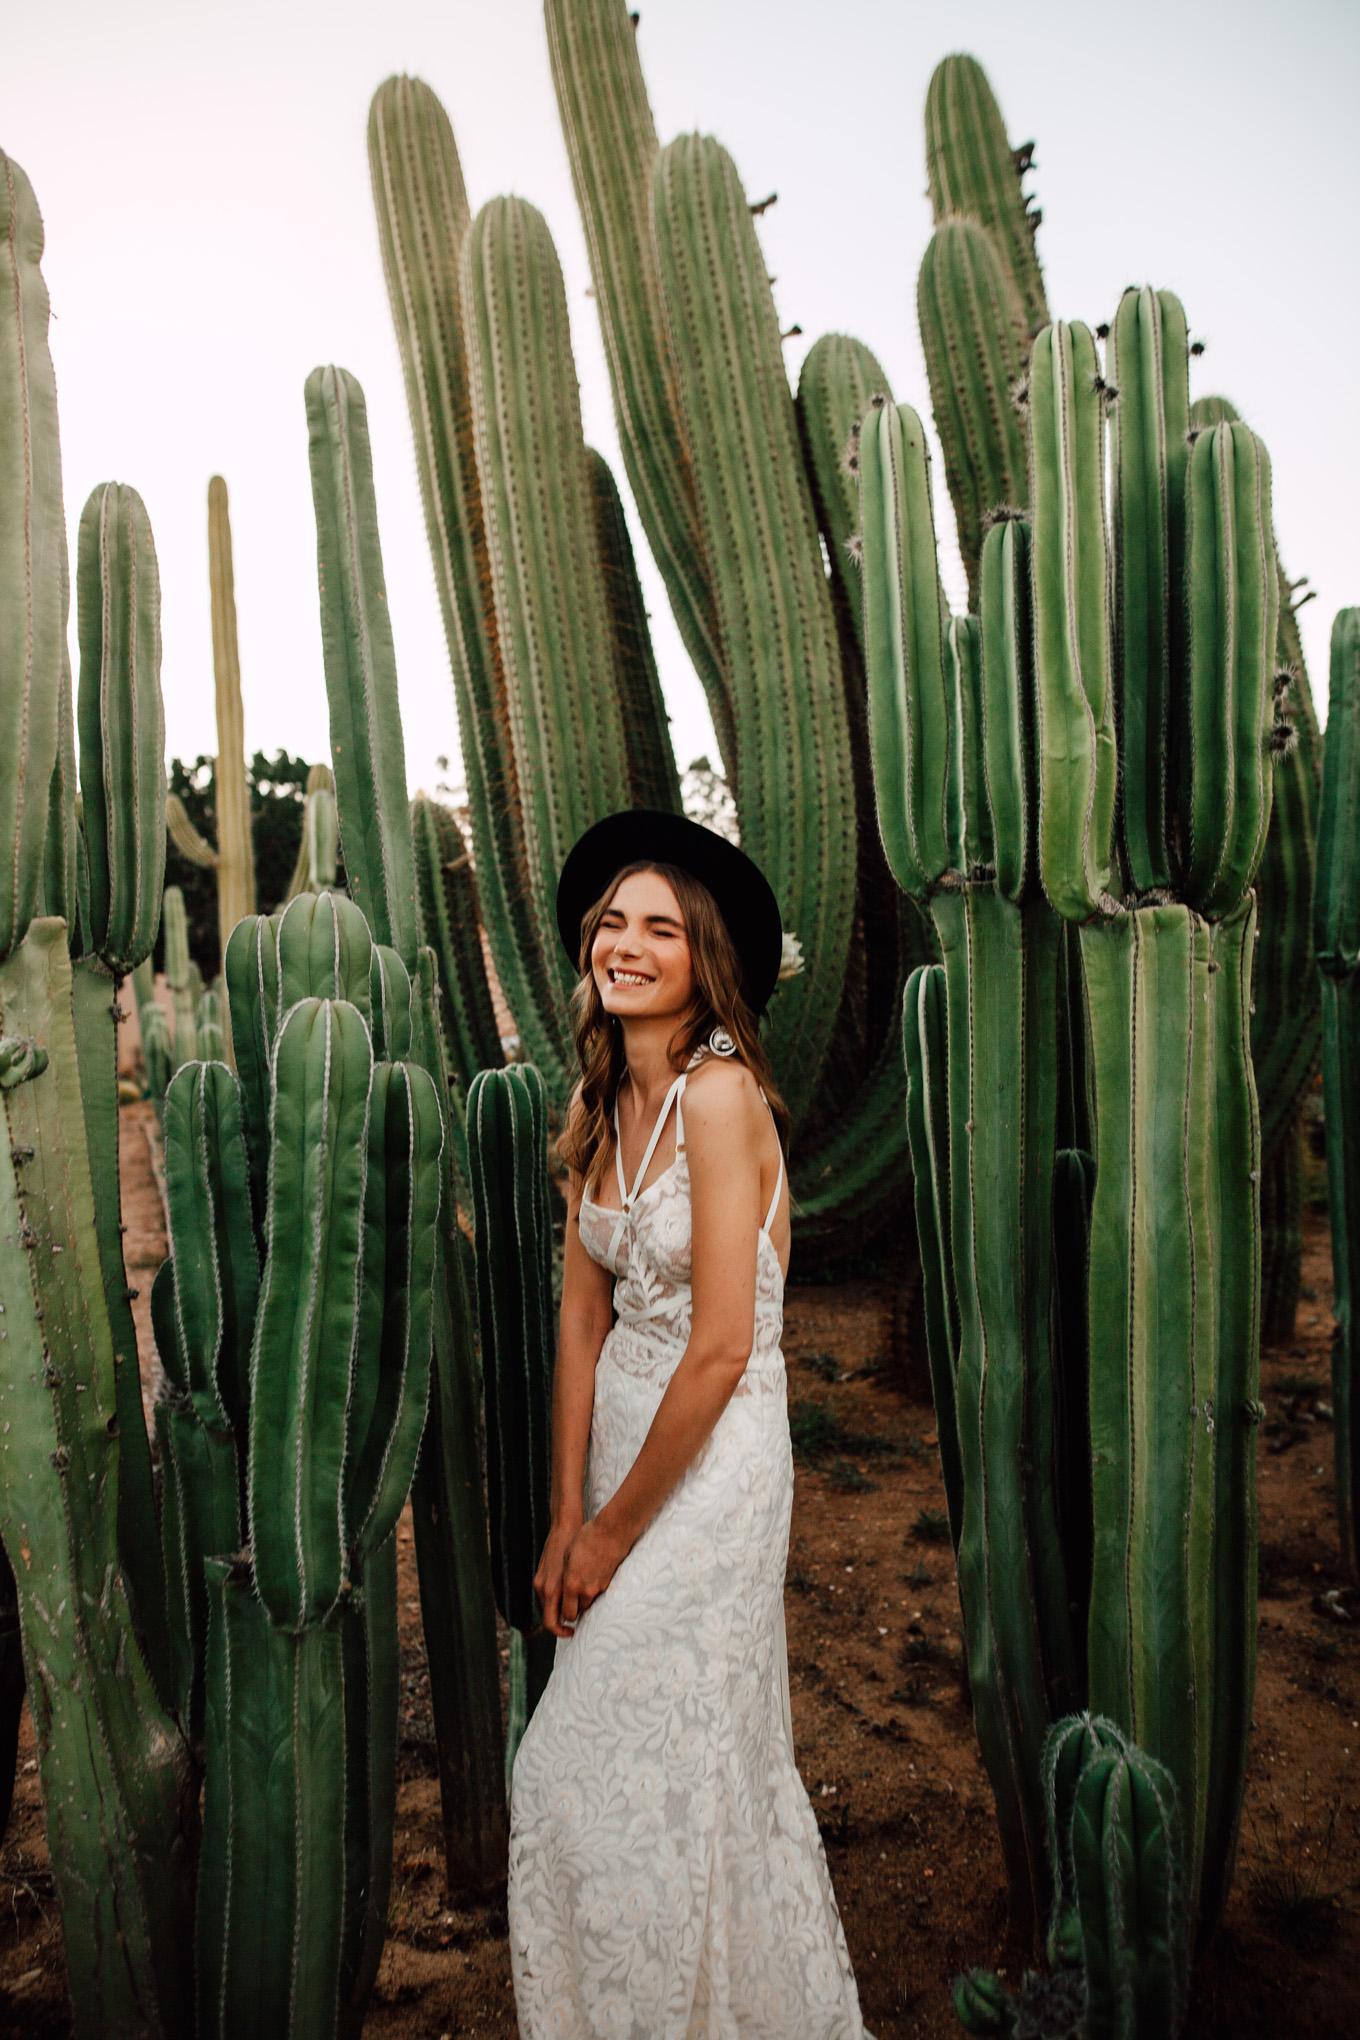 Cape-Town-Pia-Anna-Christian-Wedding-Photography-South-Africa-Bride-Cactus-26.jpg